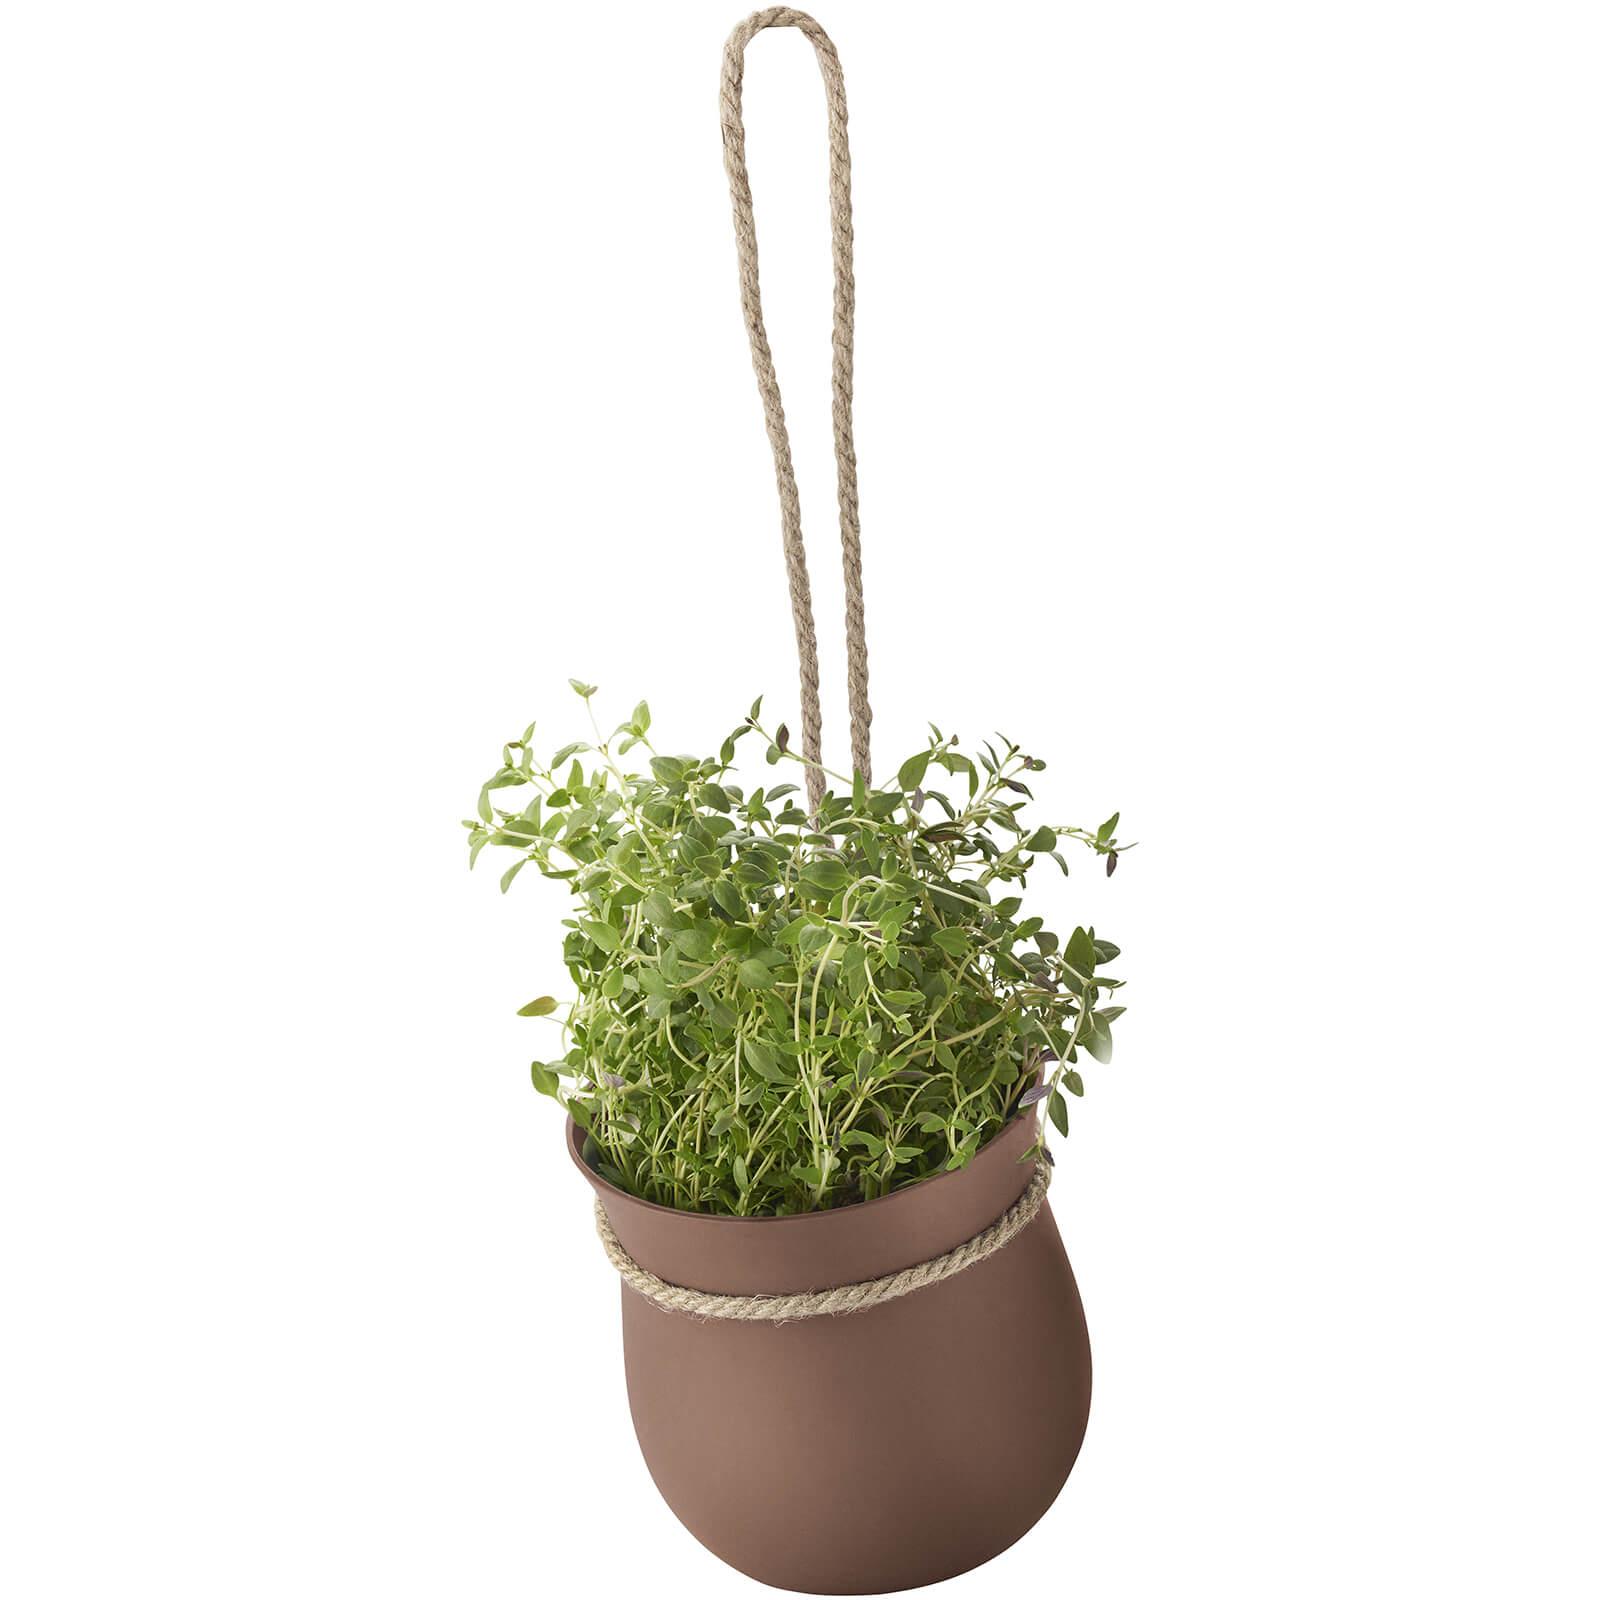 RIG-TIG Grow-It Herb Pot - Terracotta